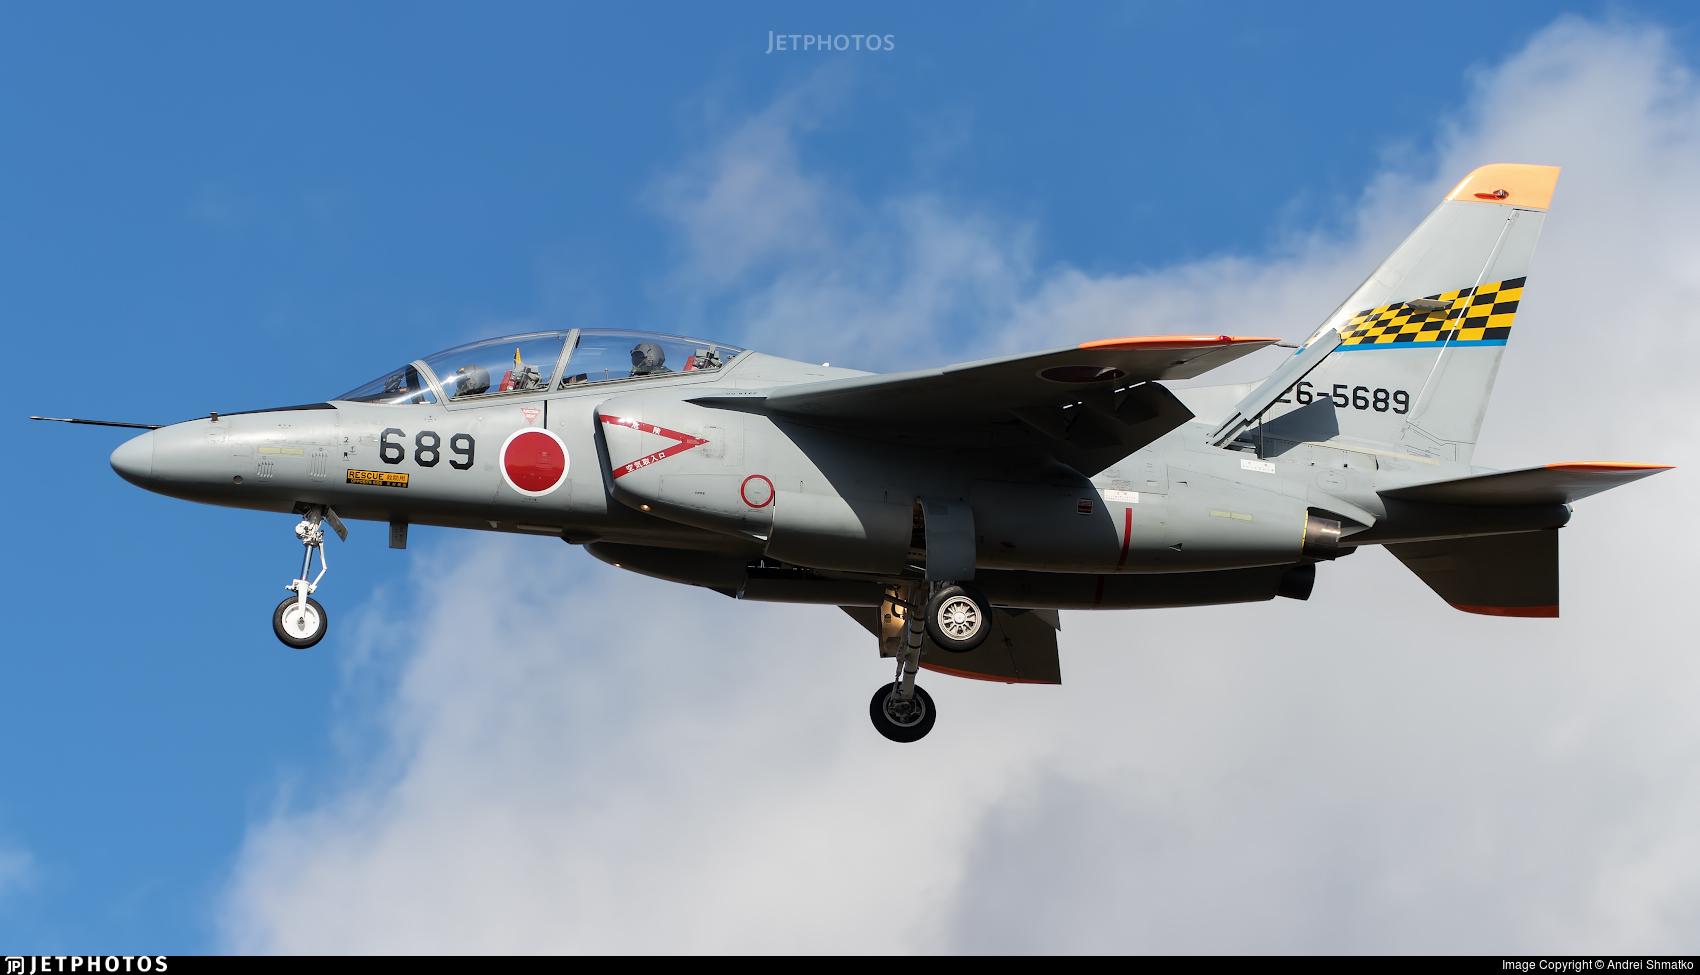 26-5689 - Kawasaki T-4 - Japan - Air Self Defence Force (JASDF)